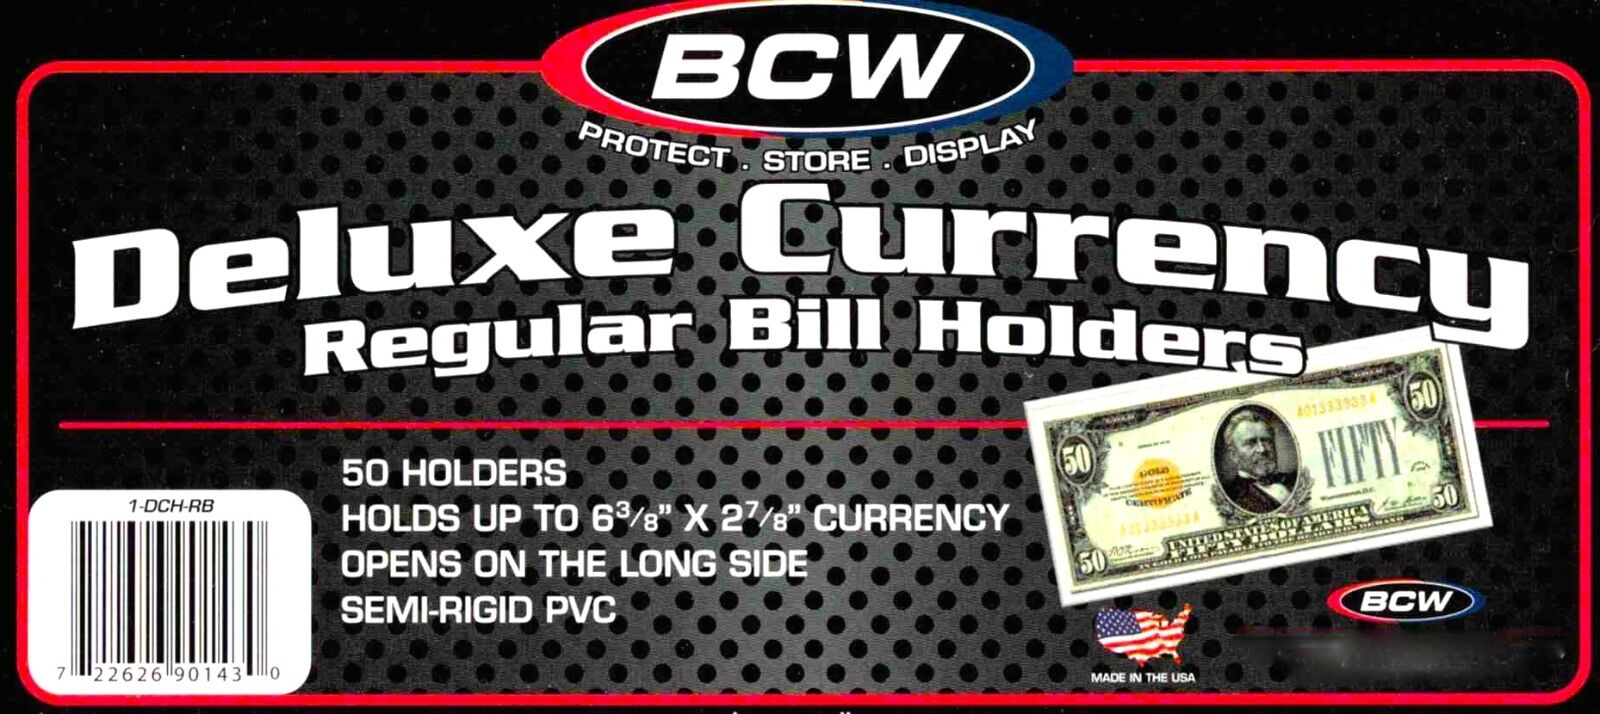 50 Regular Bill Semi Rigid Holders Protectors Dollar Currency Mailer